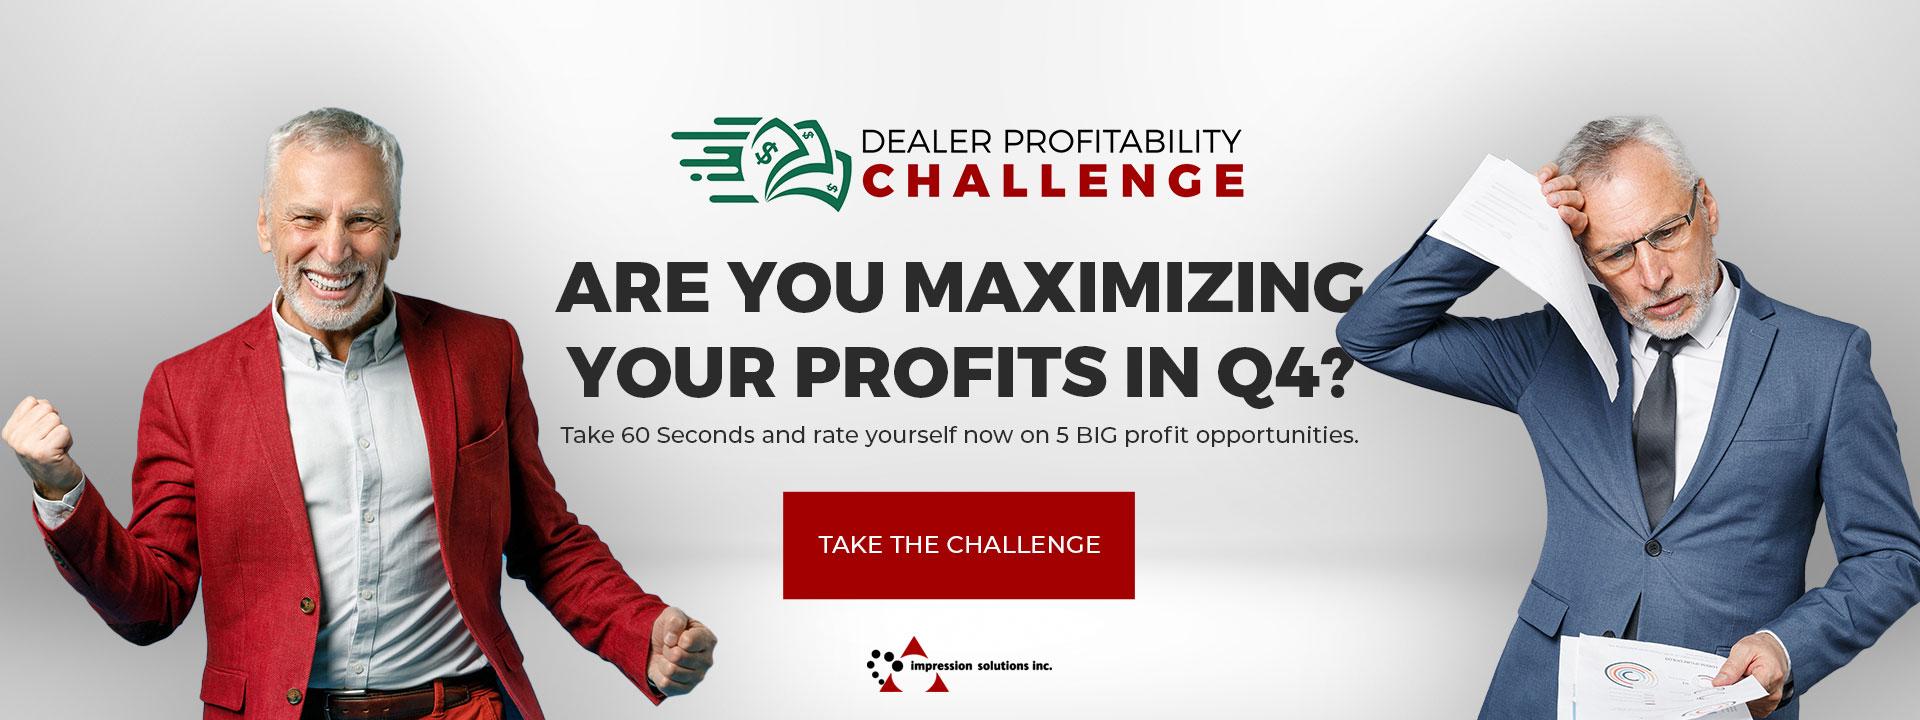 dealer-profitability-challenge